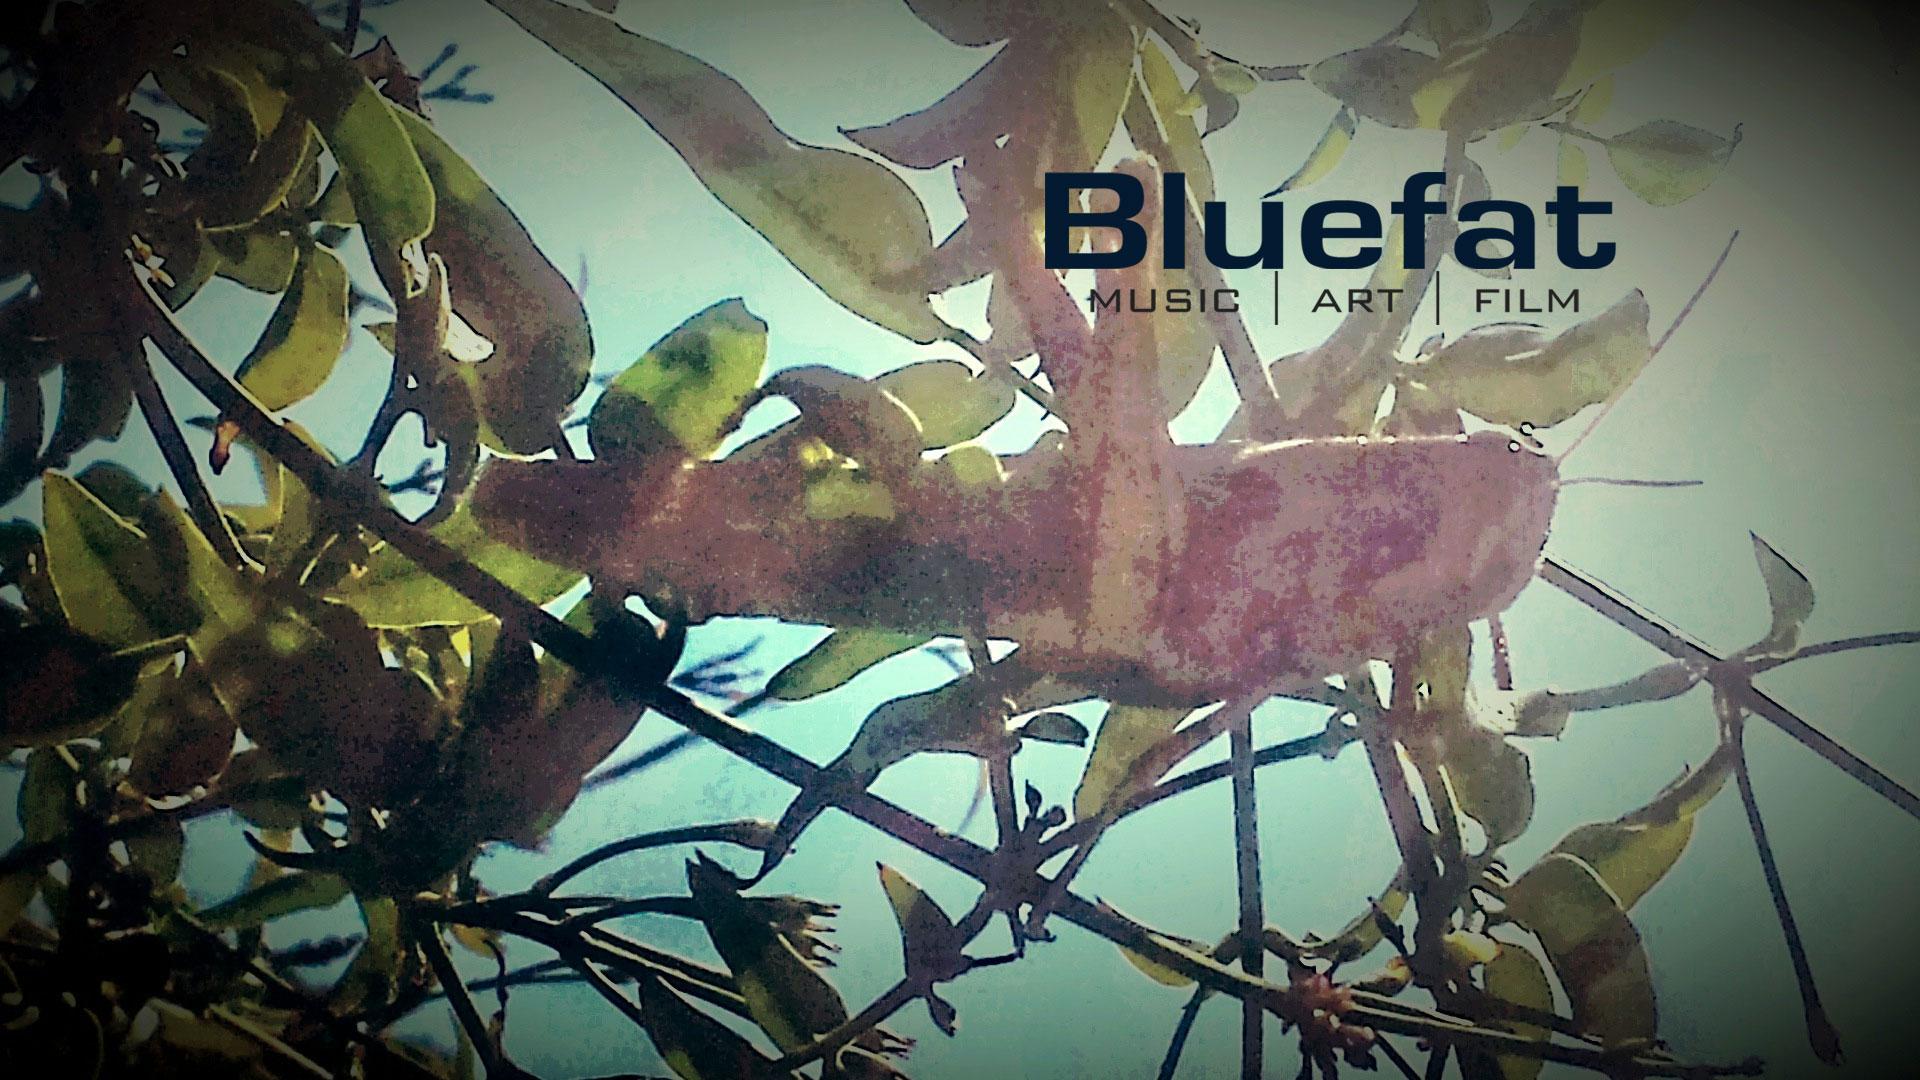 Bluefat